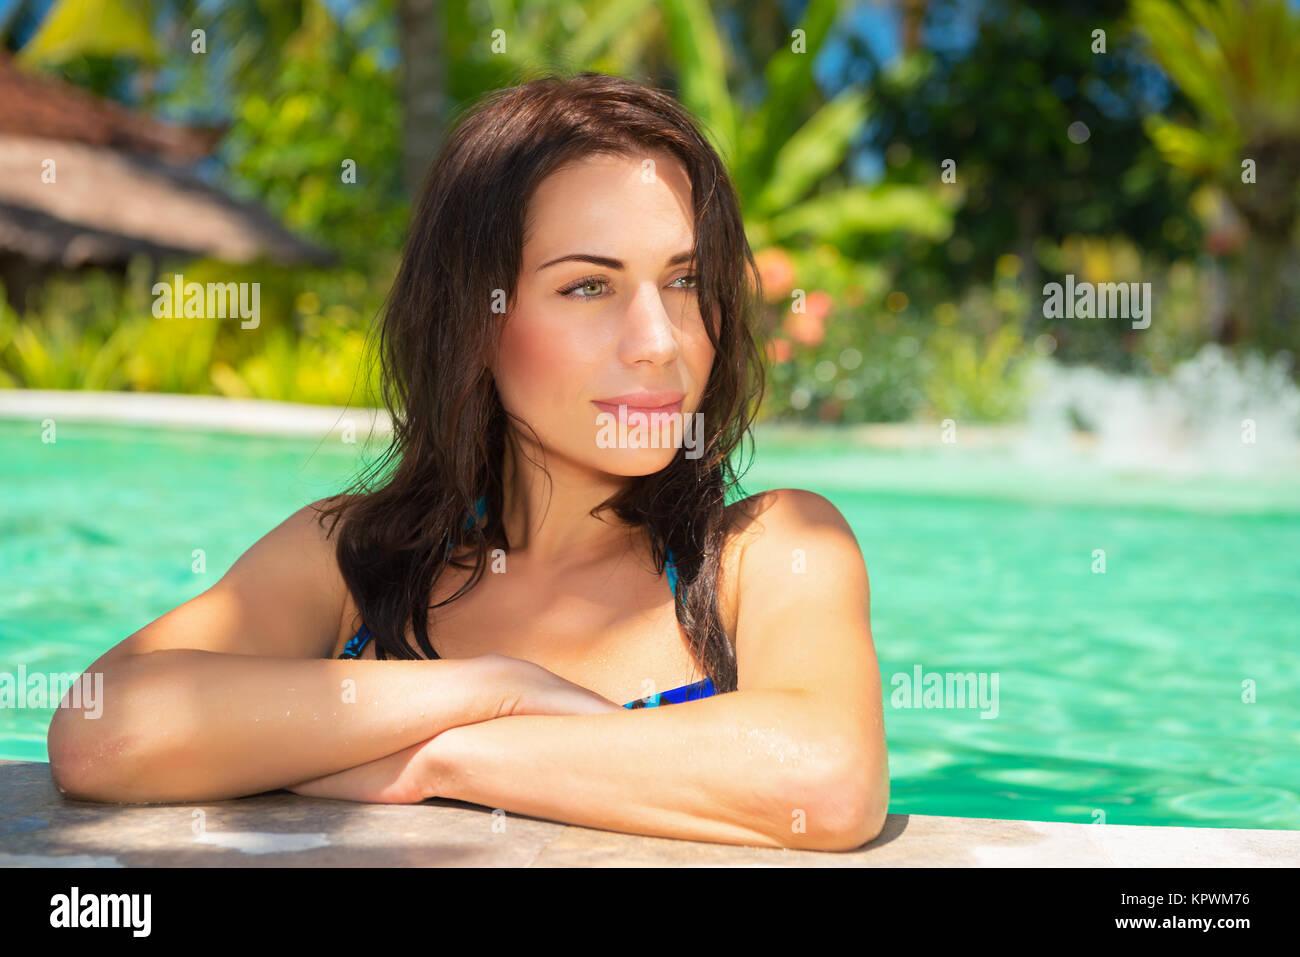 Nice female on a beach resort - Stock Image